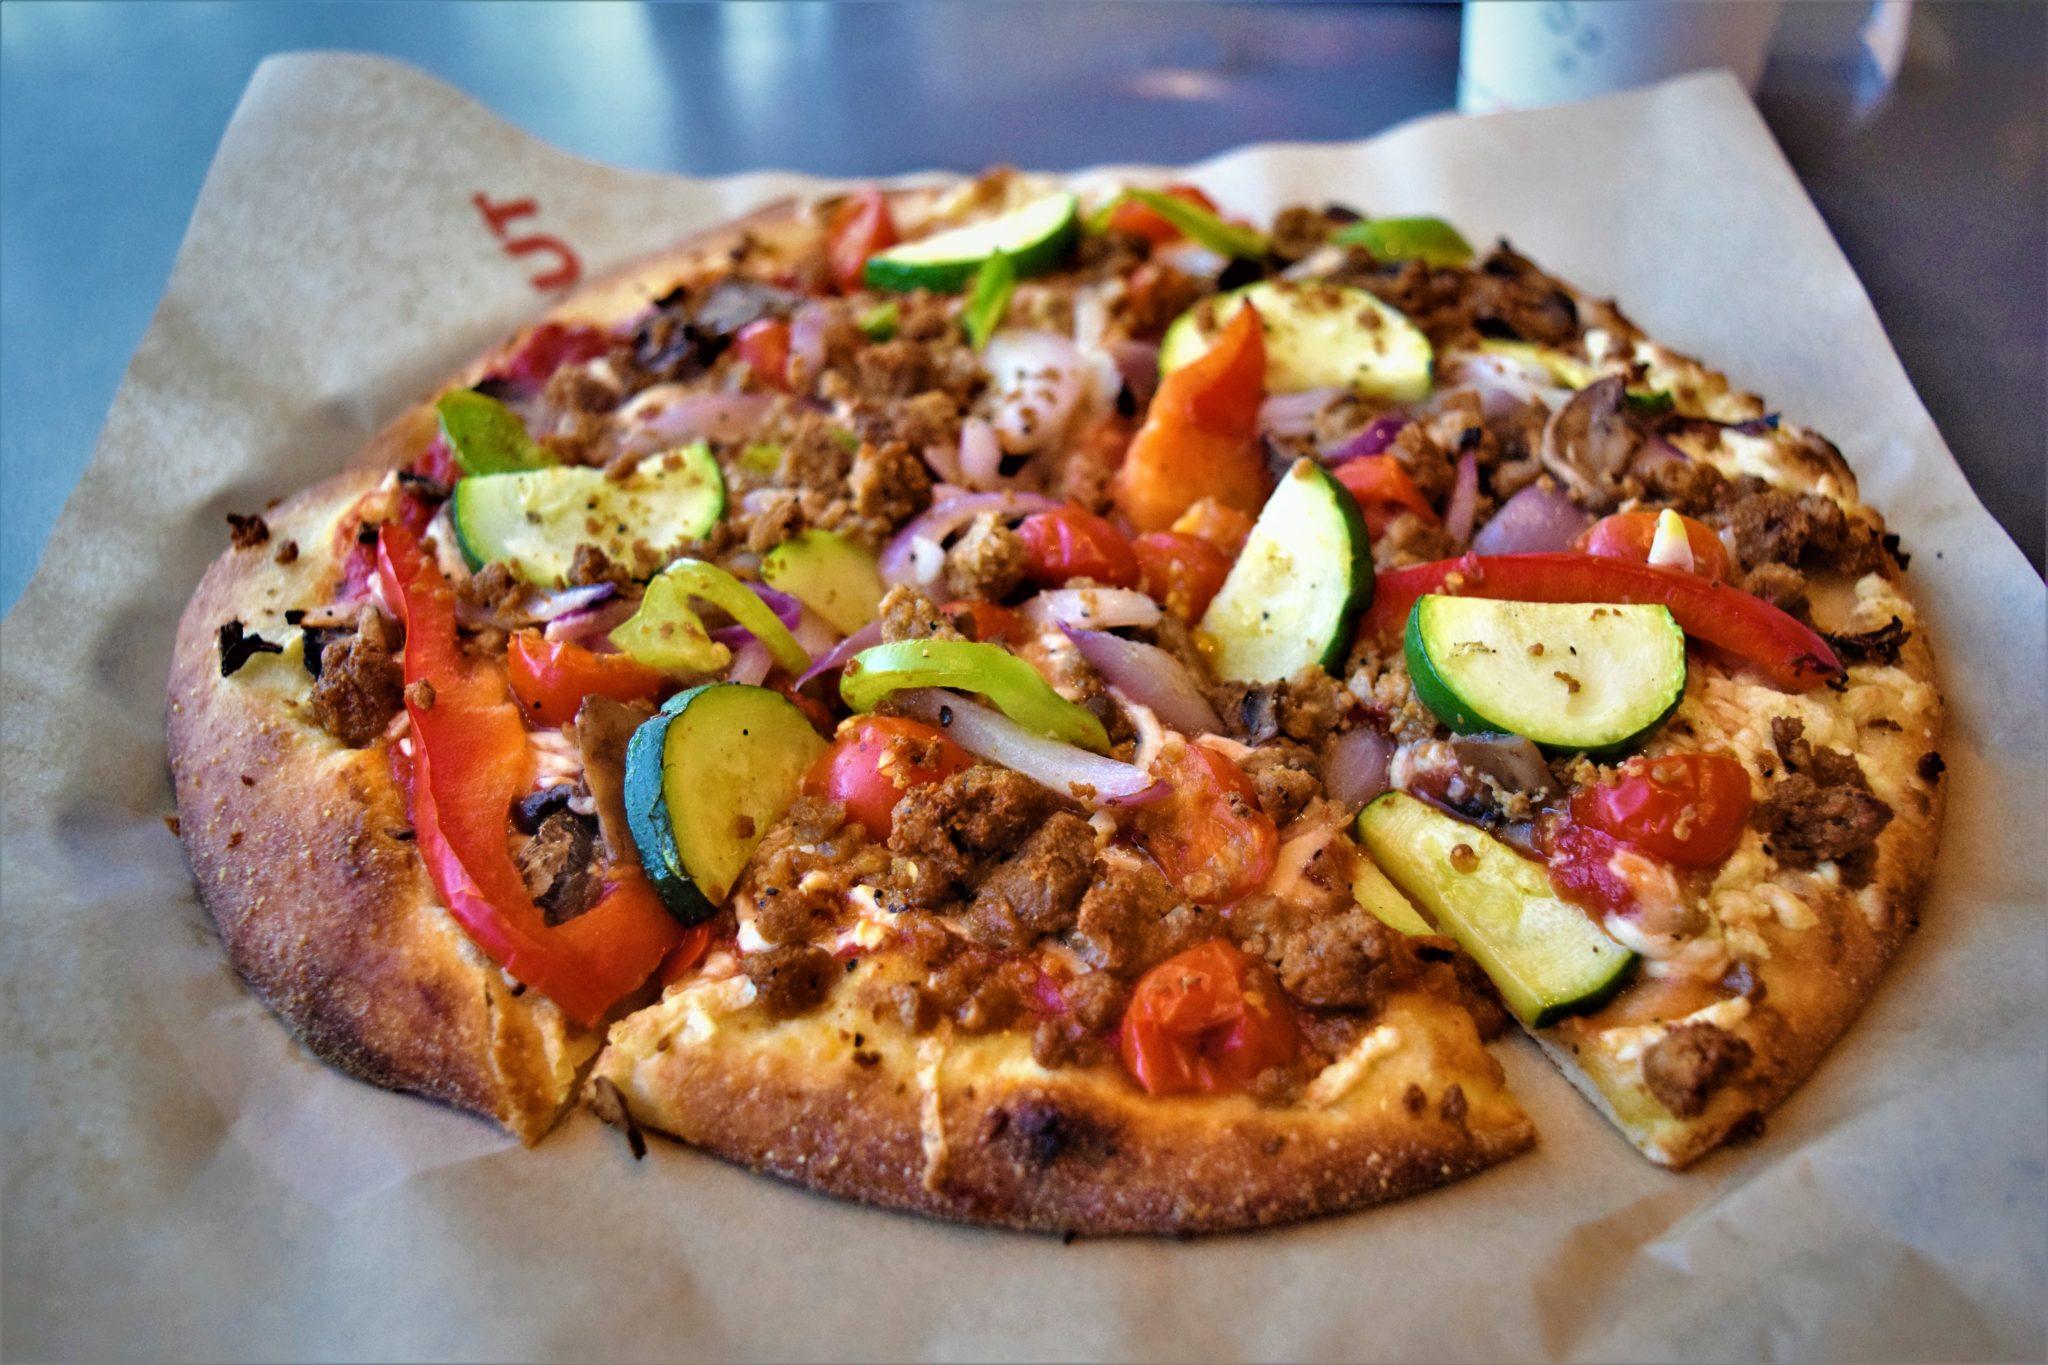 Vegan pizza, the berkley at zpizza los angeles vegan food in los angeles